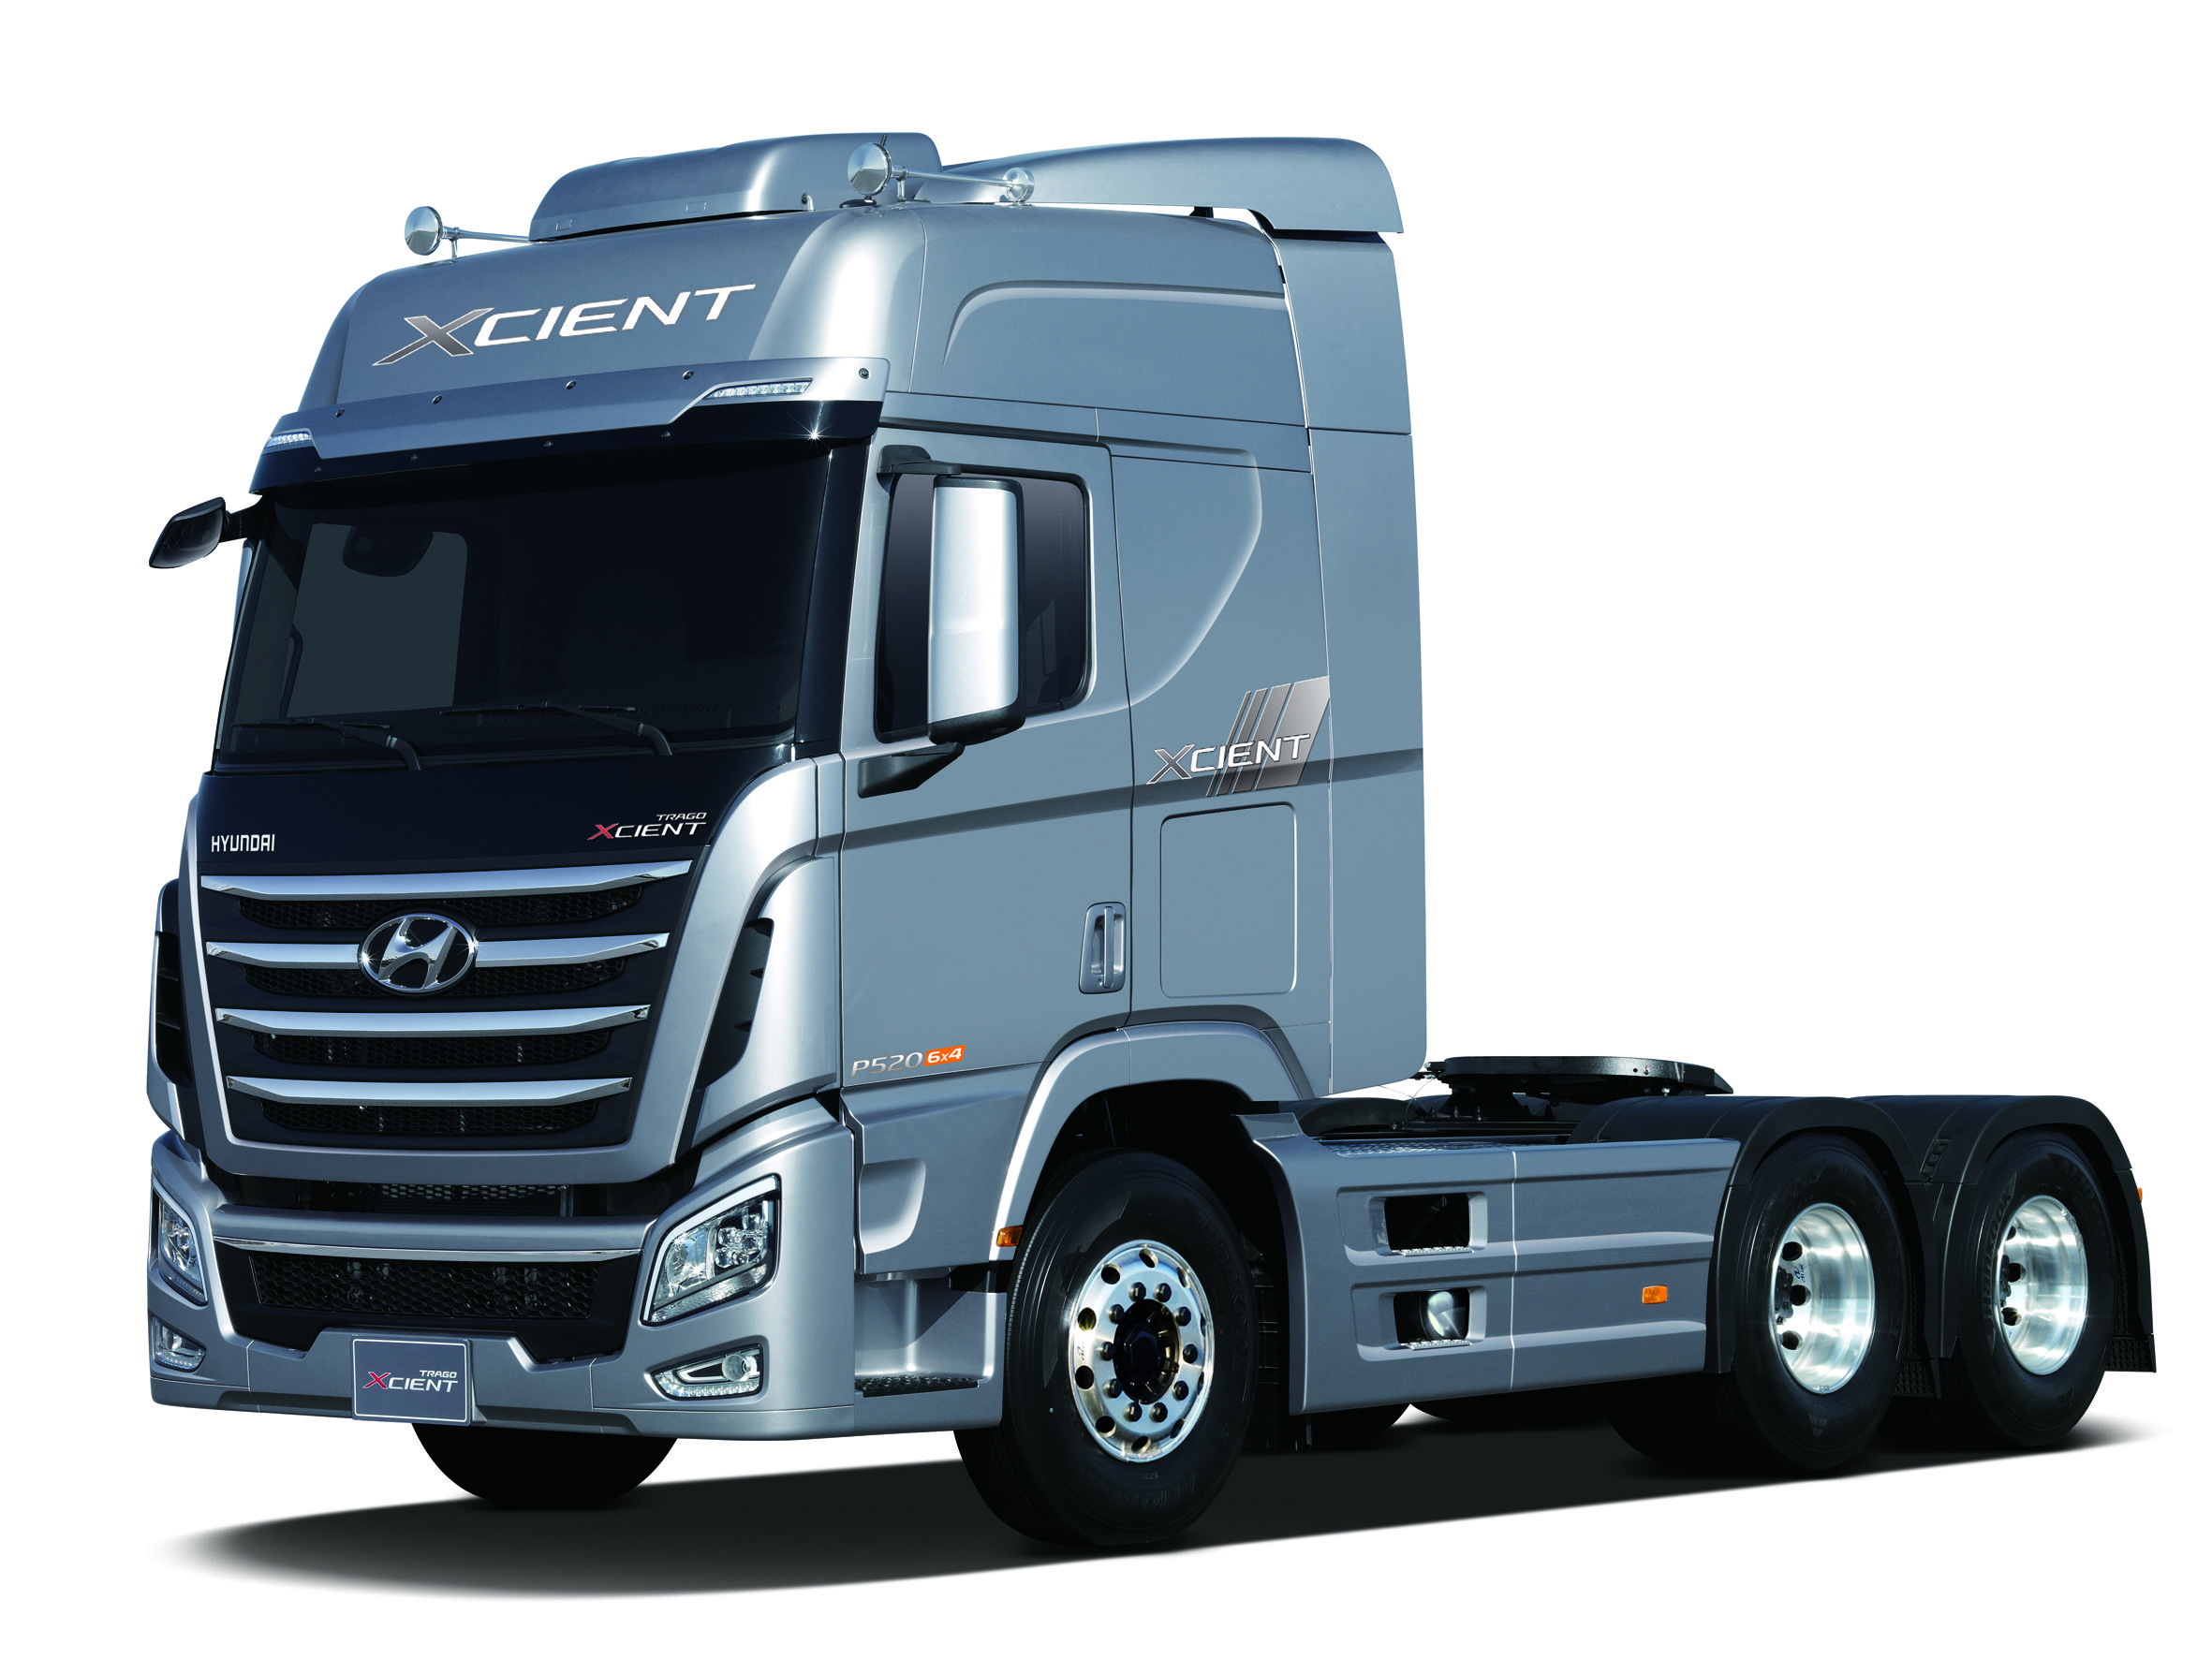 motor trend pickup truck almost crossover front hyundai three en santa concept ready cruz news trucks canada